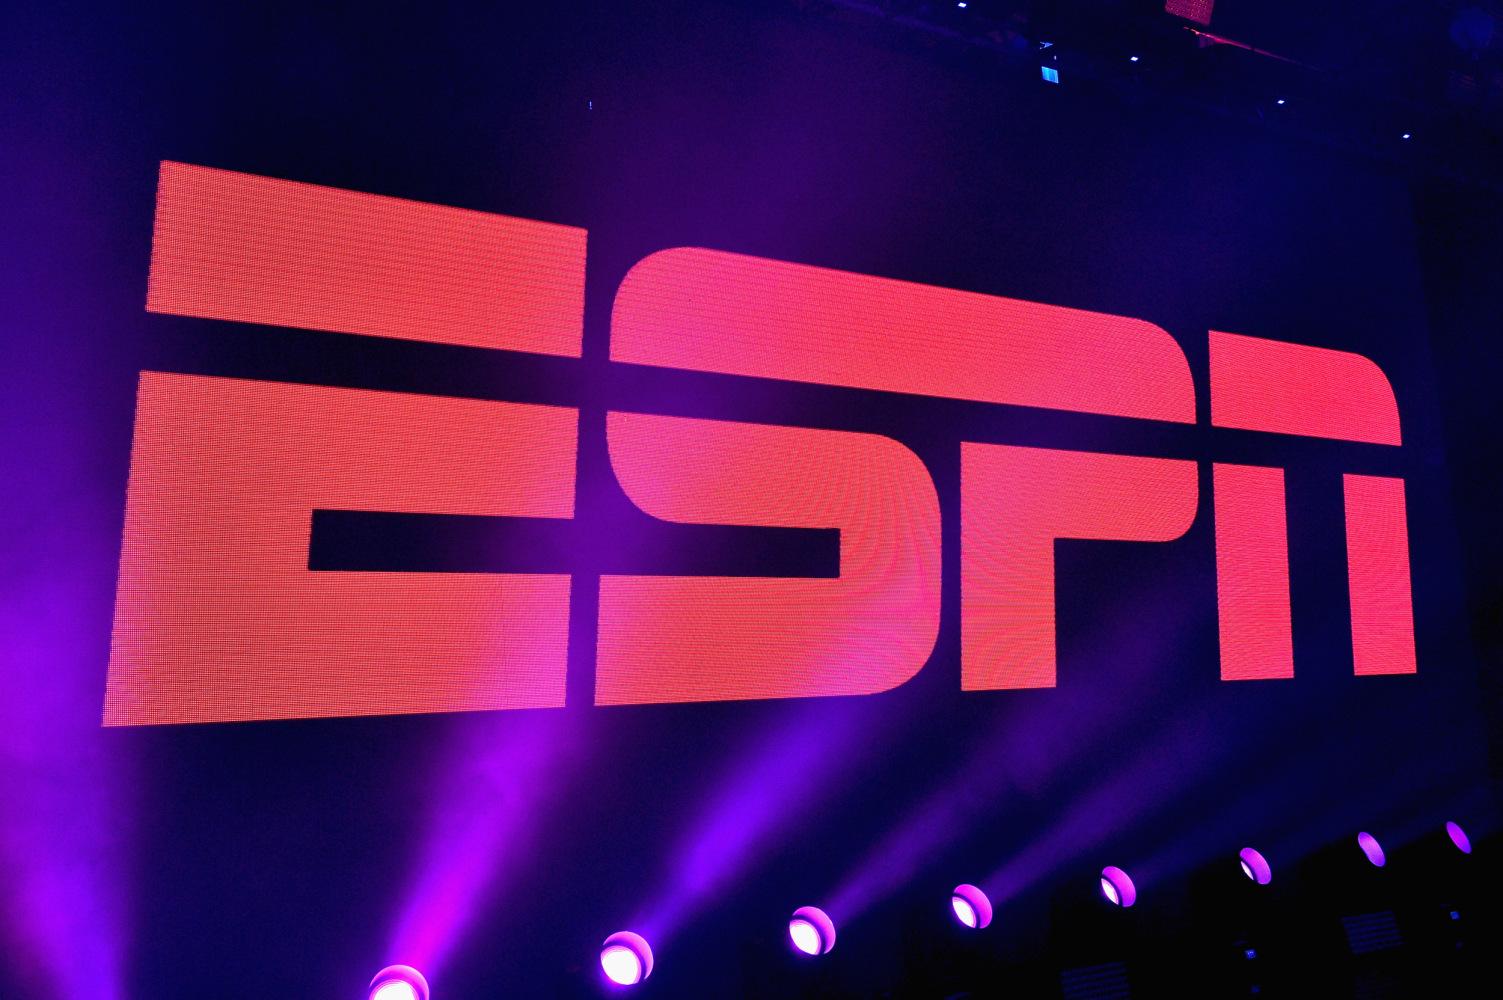 ESPN to Layoff 150 Employees